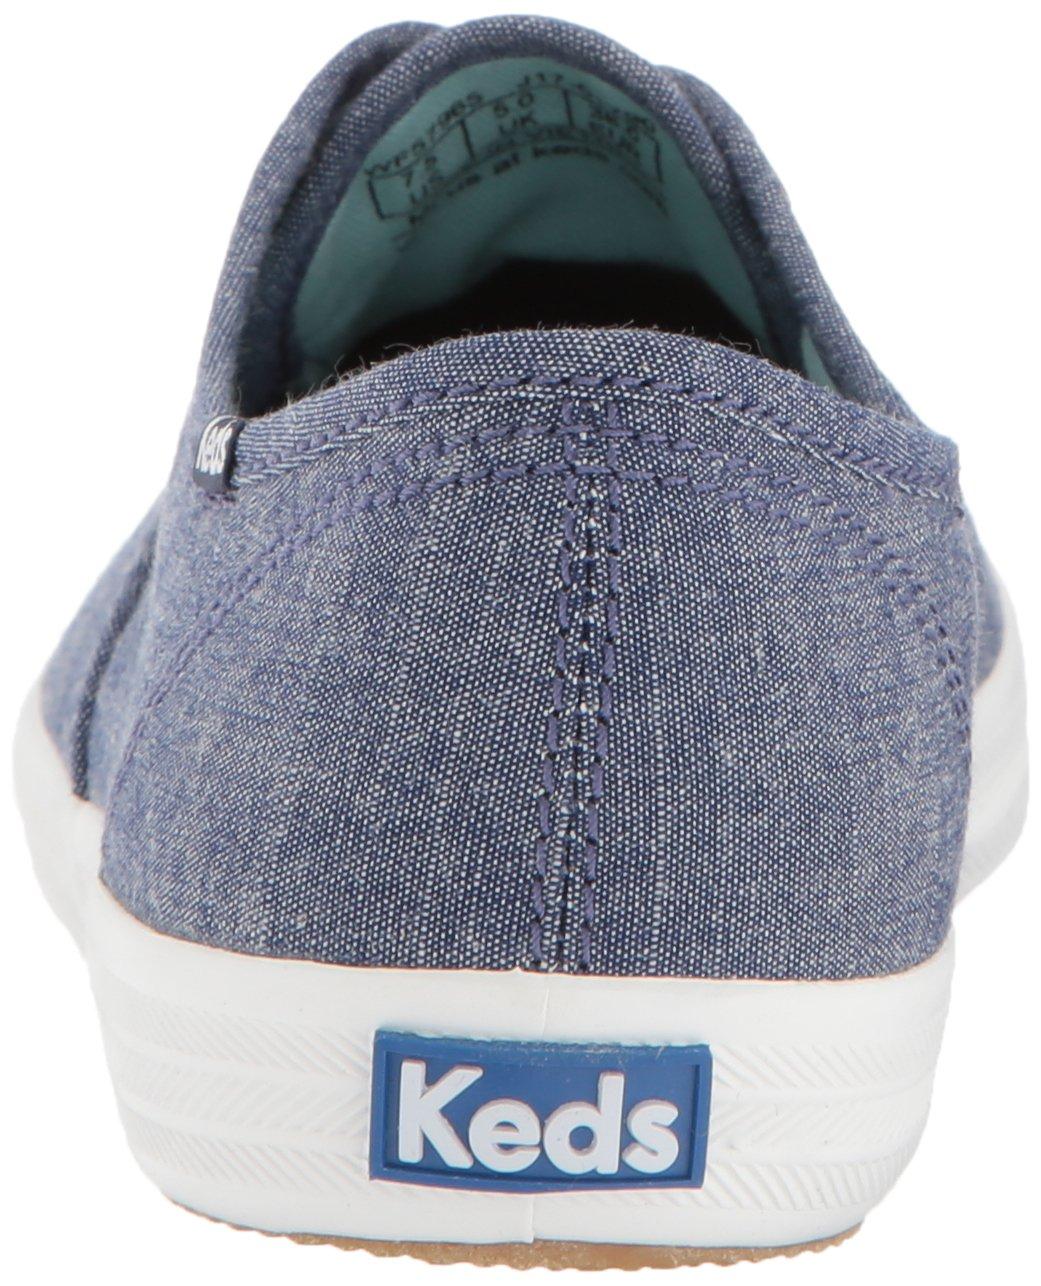 Keds Sneaker Women's Champion Seasonal Spring 2015 Sneaker Keds B072MPZWMP 6 B(M) US Navy a19331